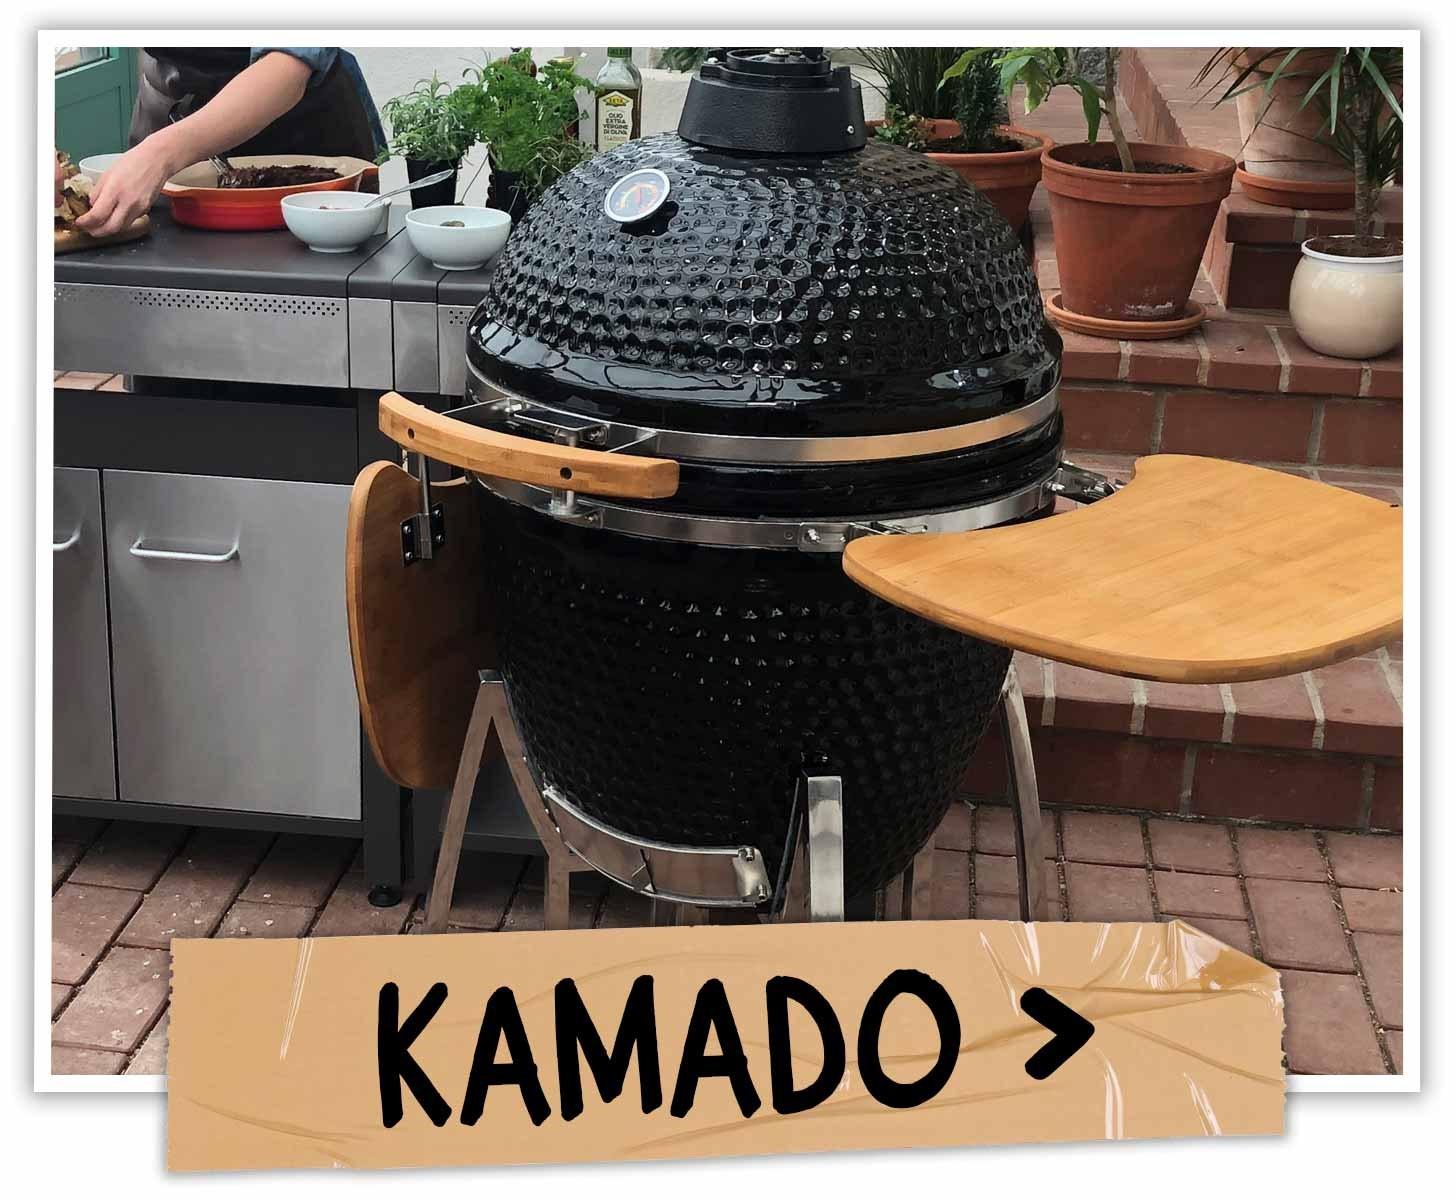 Grillskole - Kamado